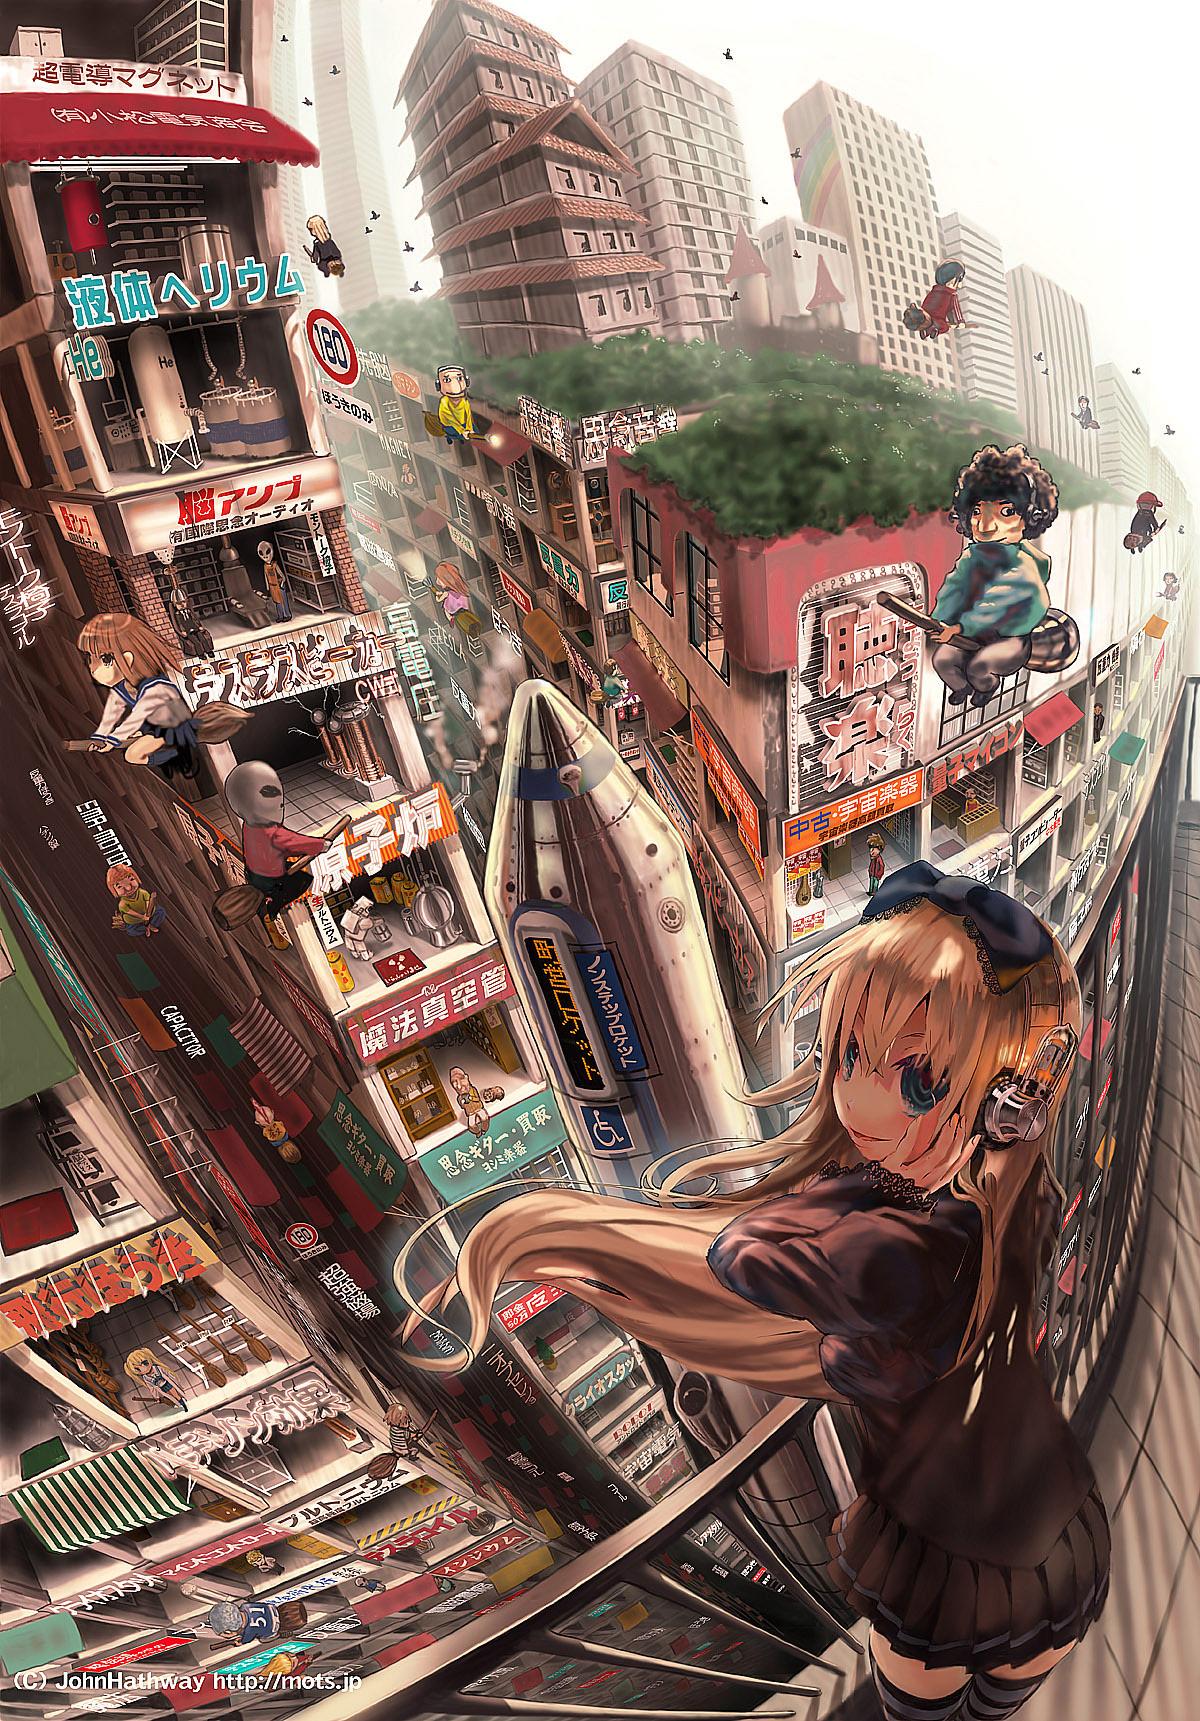 JohnHathway-anime-3d-19